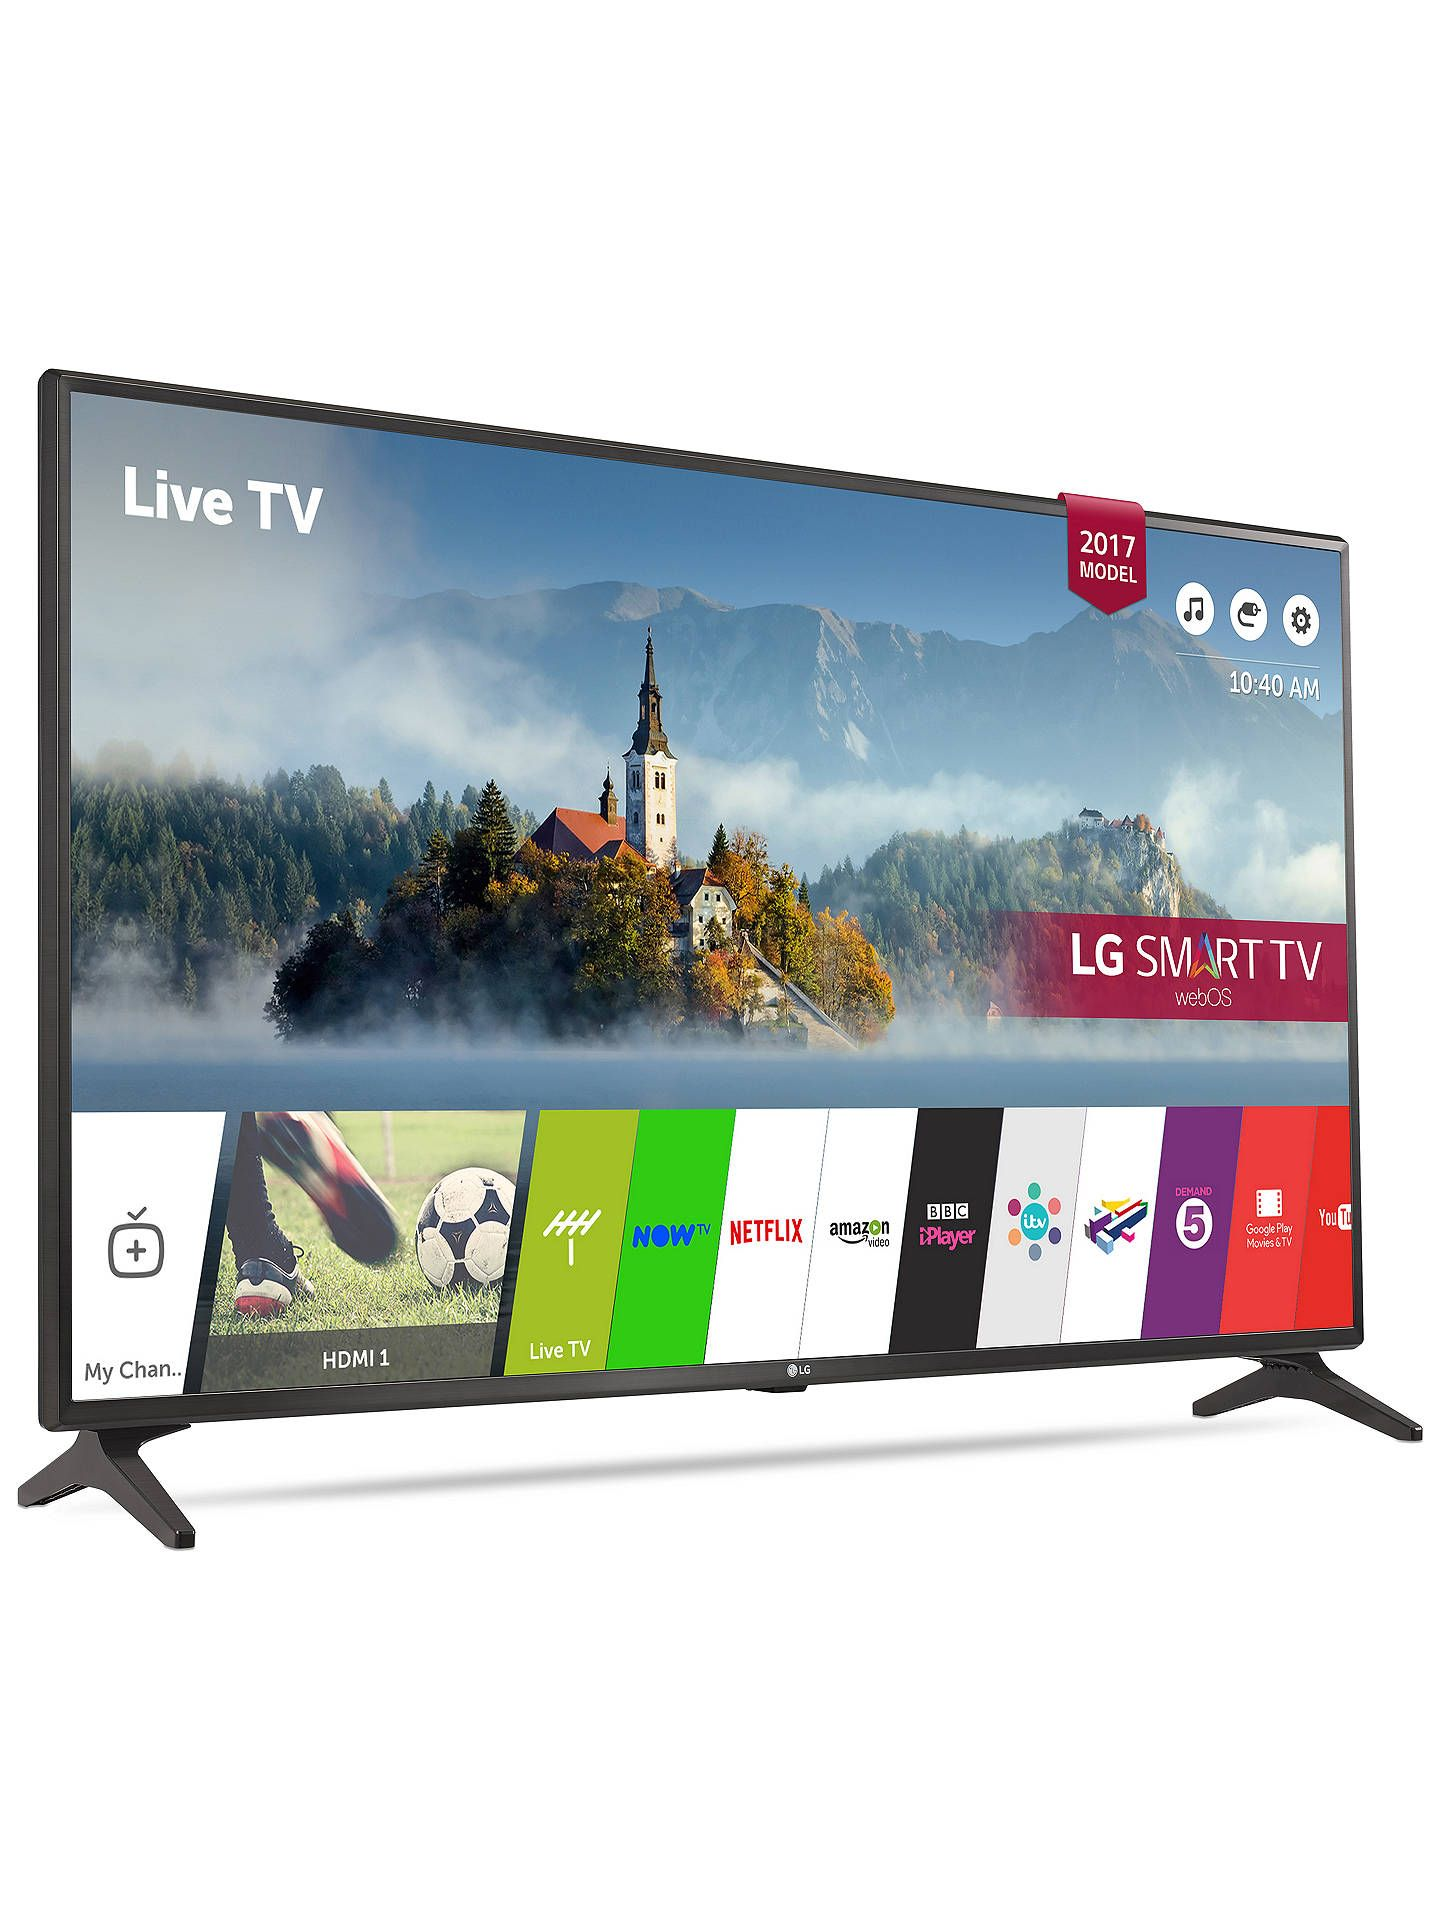 Lot 16049 - V Grade A LG 43 Inch FULL HD LED SMART TV WITH FREEVIEW HD & WIFI 43LJ594V